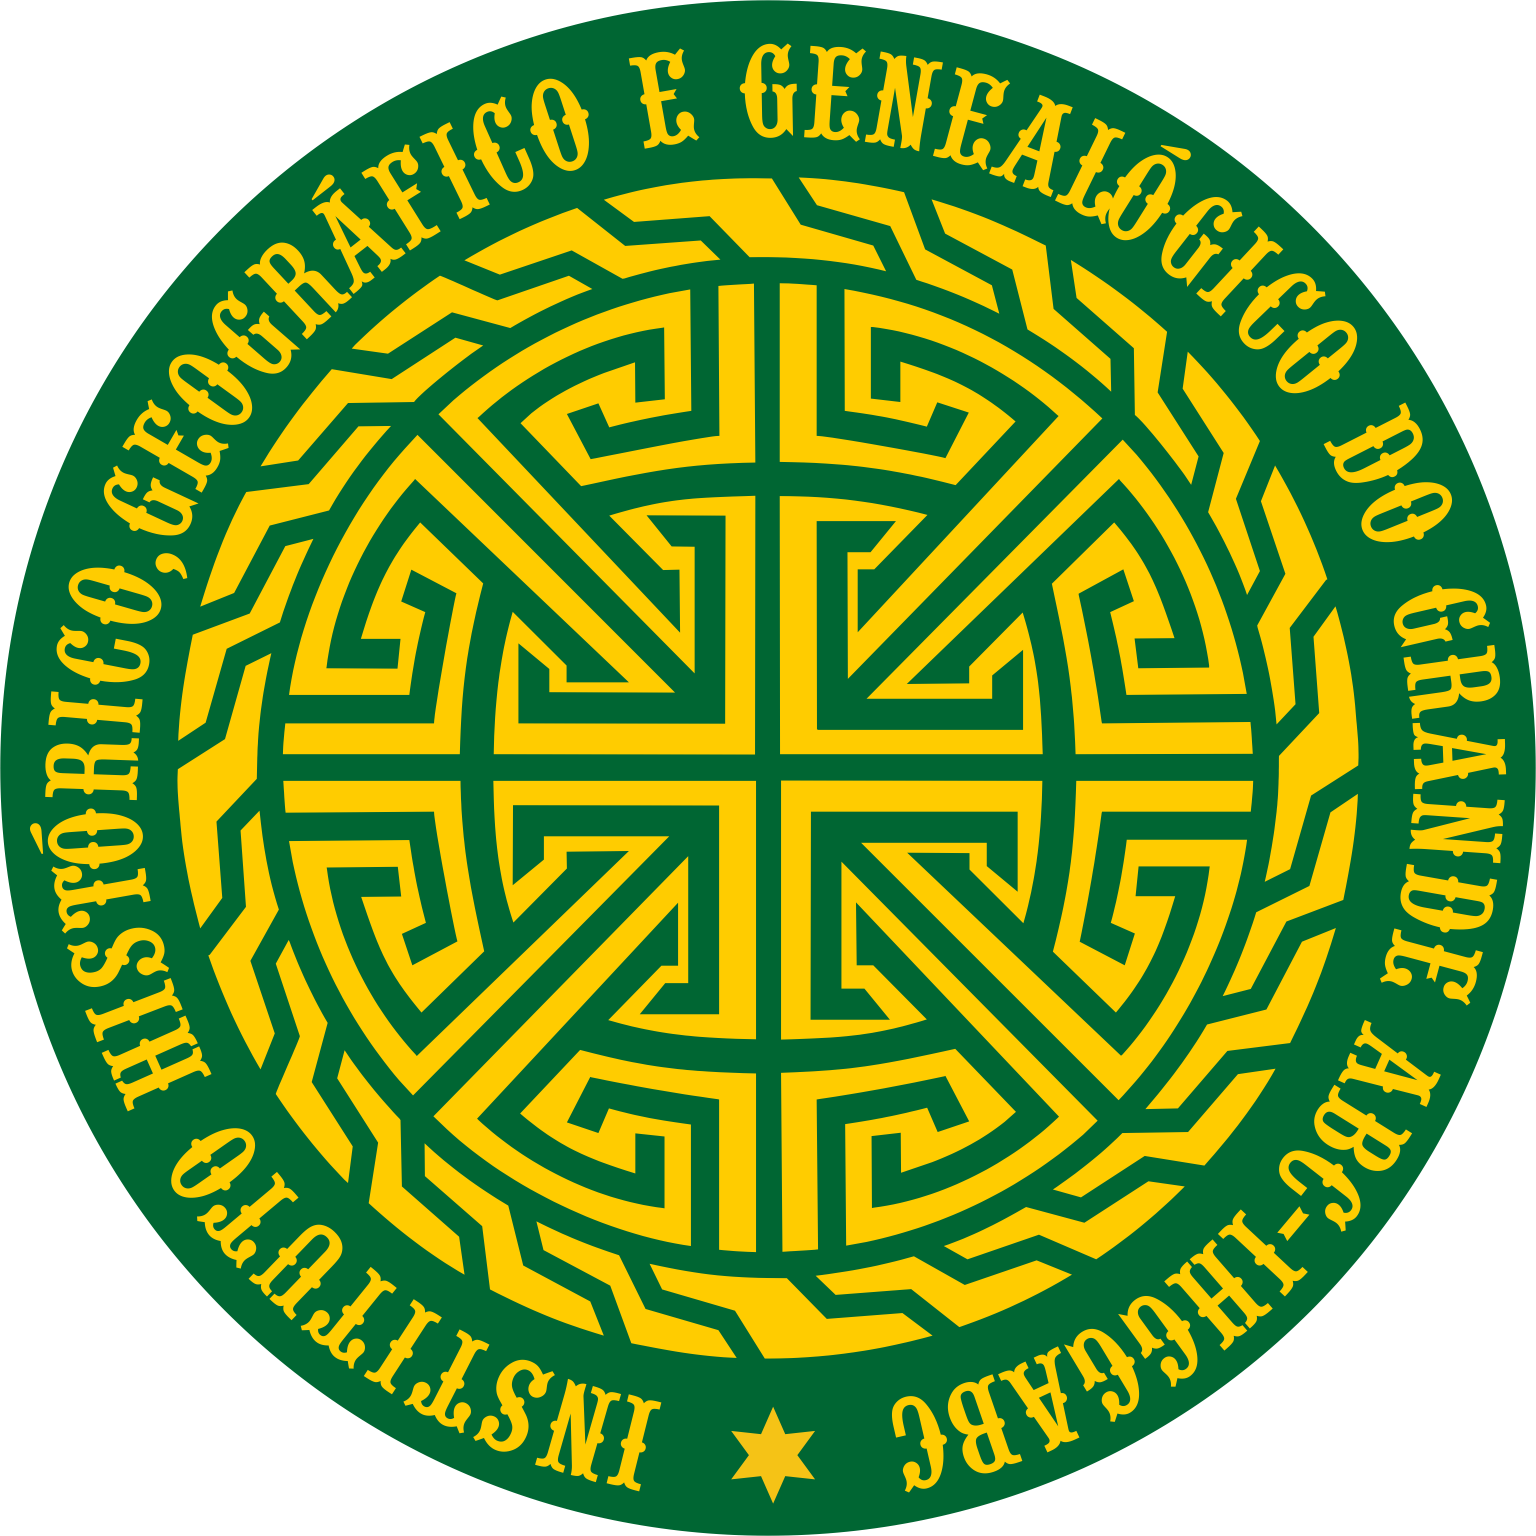 INSTITUTO HISTÓRICO,GEOGRÁFICO E GENEALÓGICO